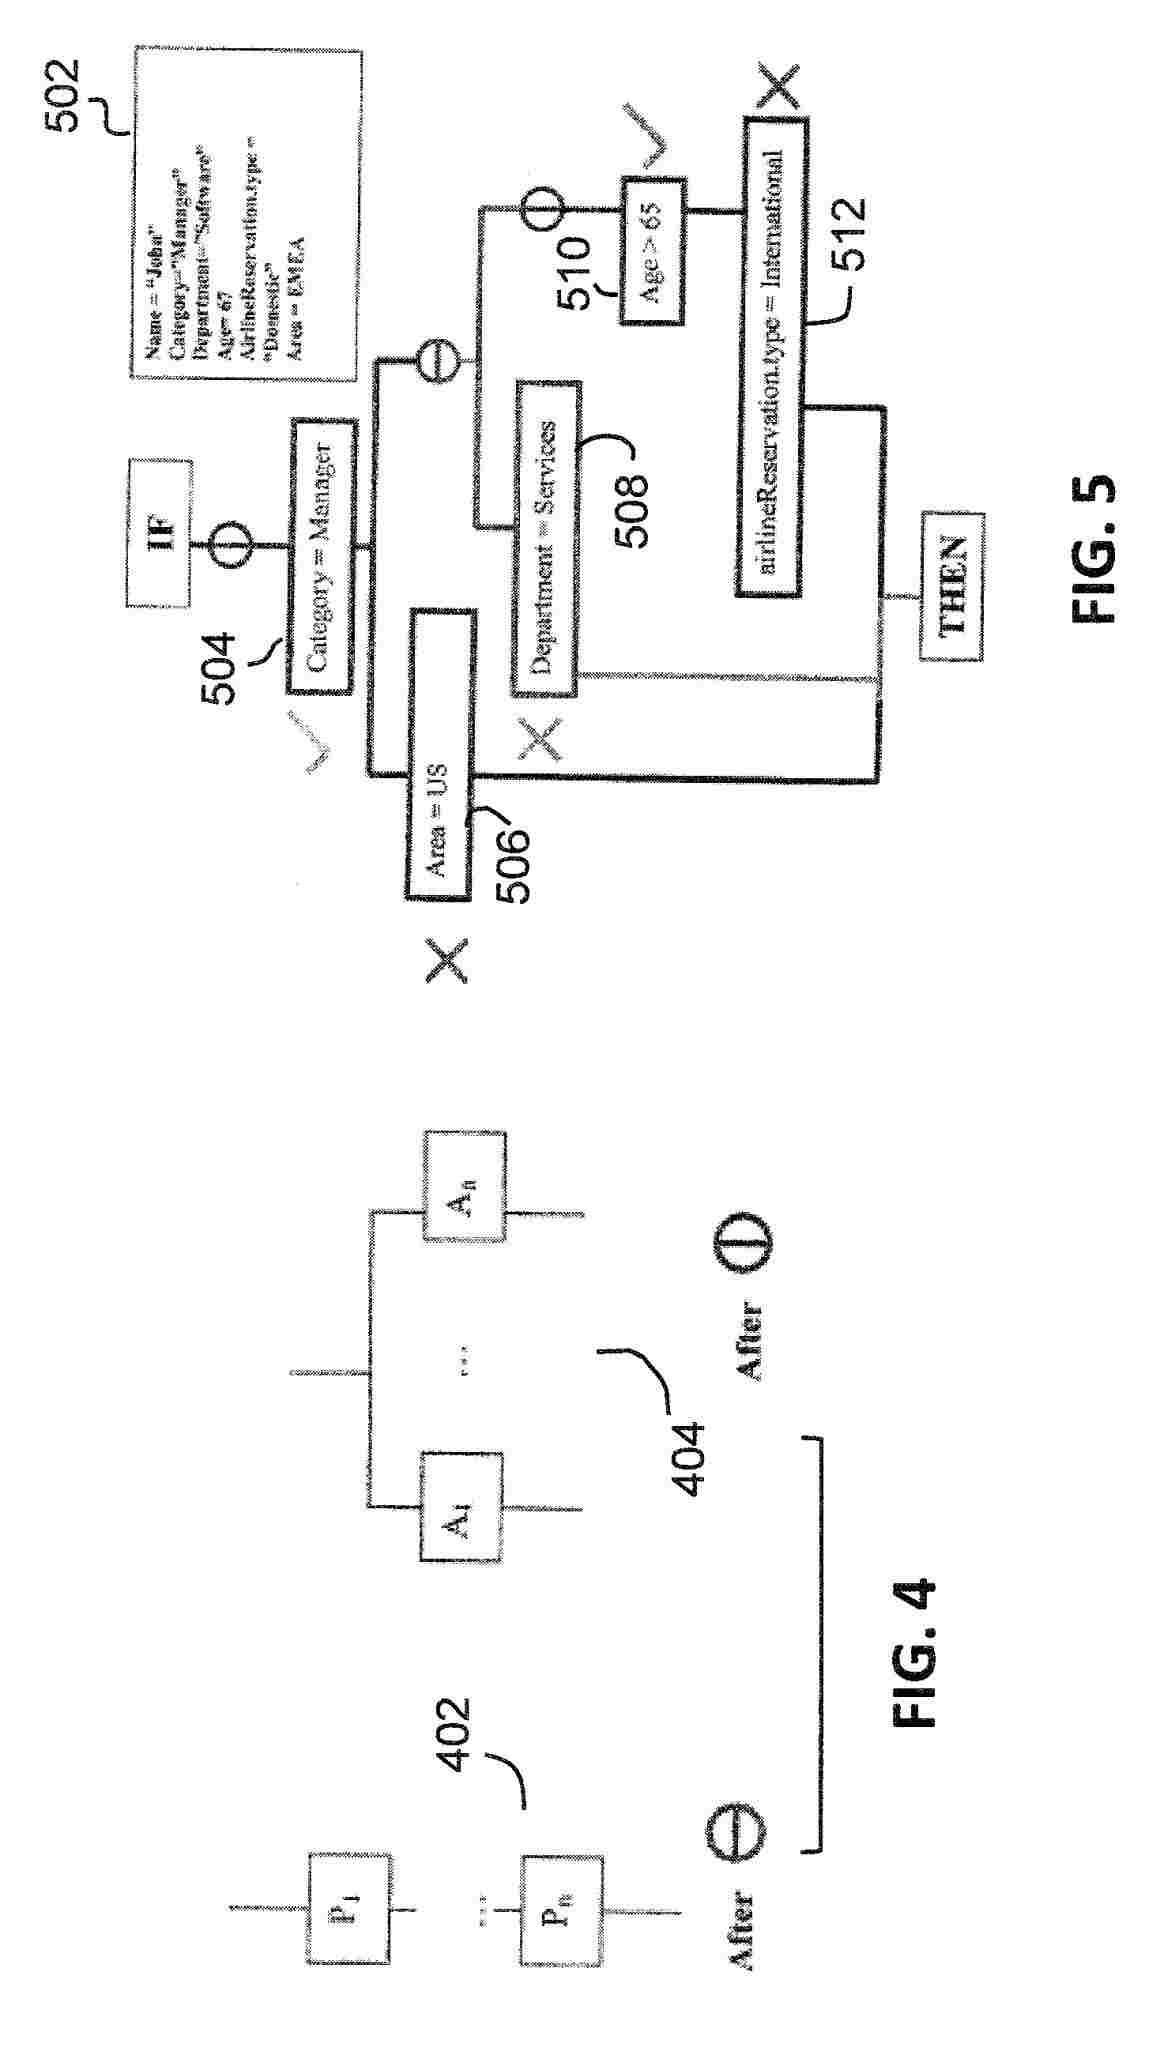 Weg-12-Lead-Motor-Wiring-Diagram-Inspirational-Dyna-Bobber - 12 Lead Motor Wiring Diagram